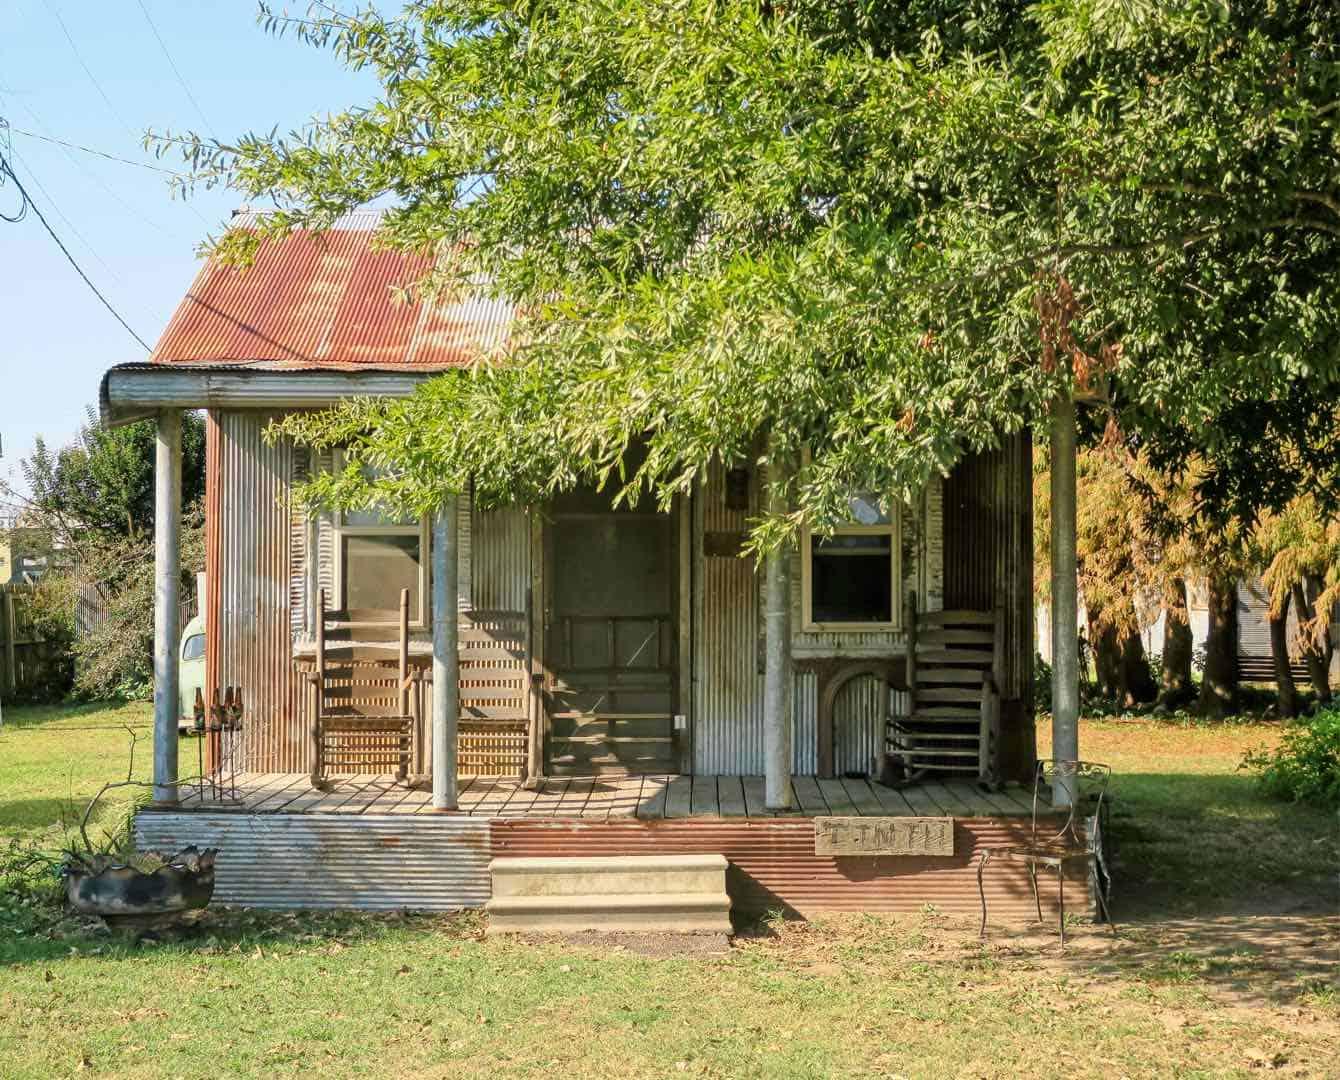 shack next to a tree